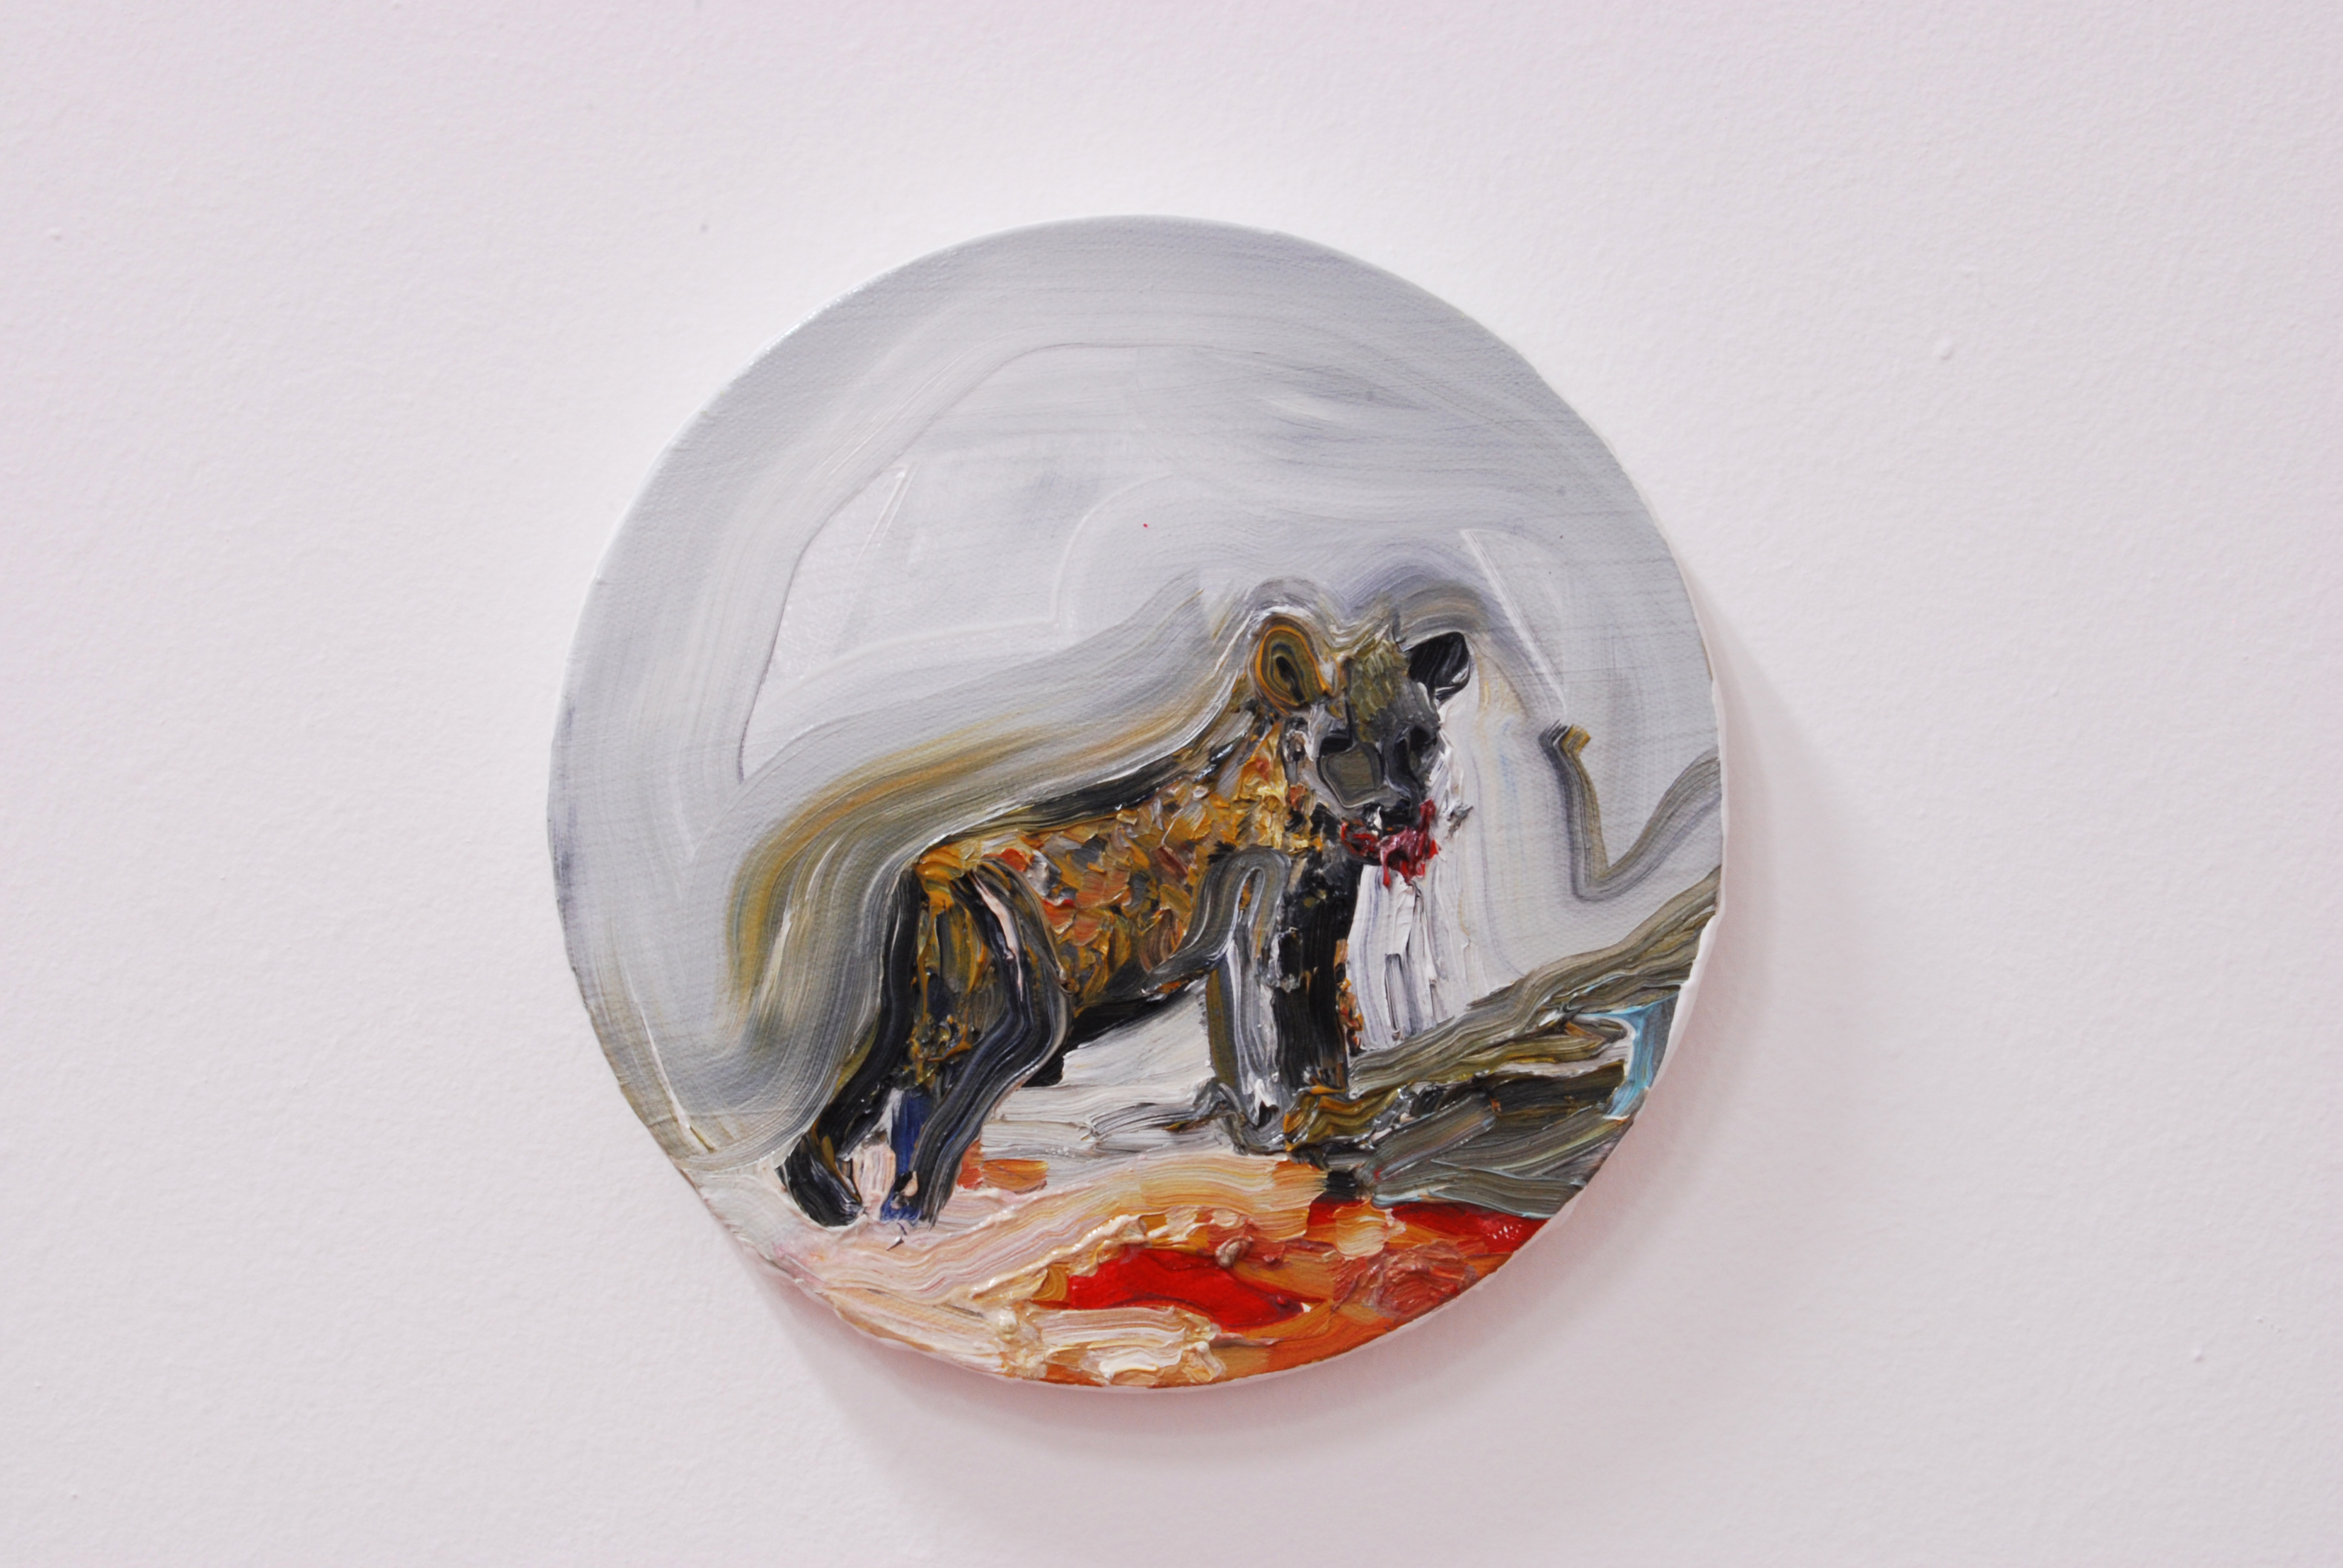 Vera Portatadino, 2014, oil on canvas, 20cm diameter